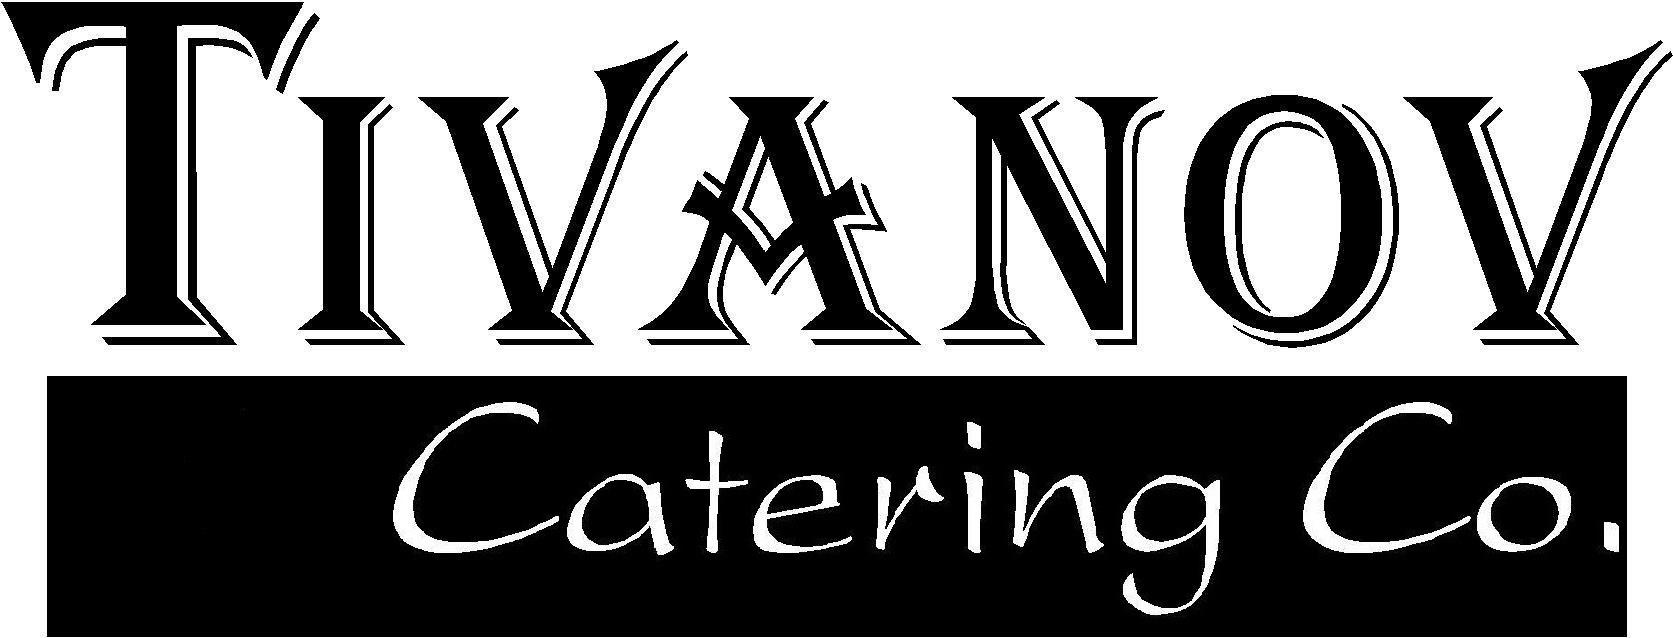 Tivanov Catering